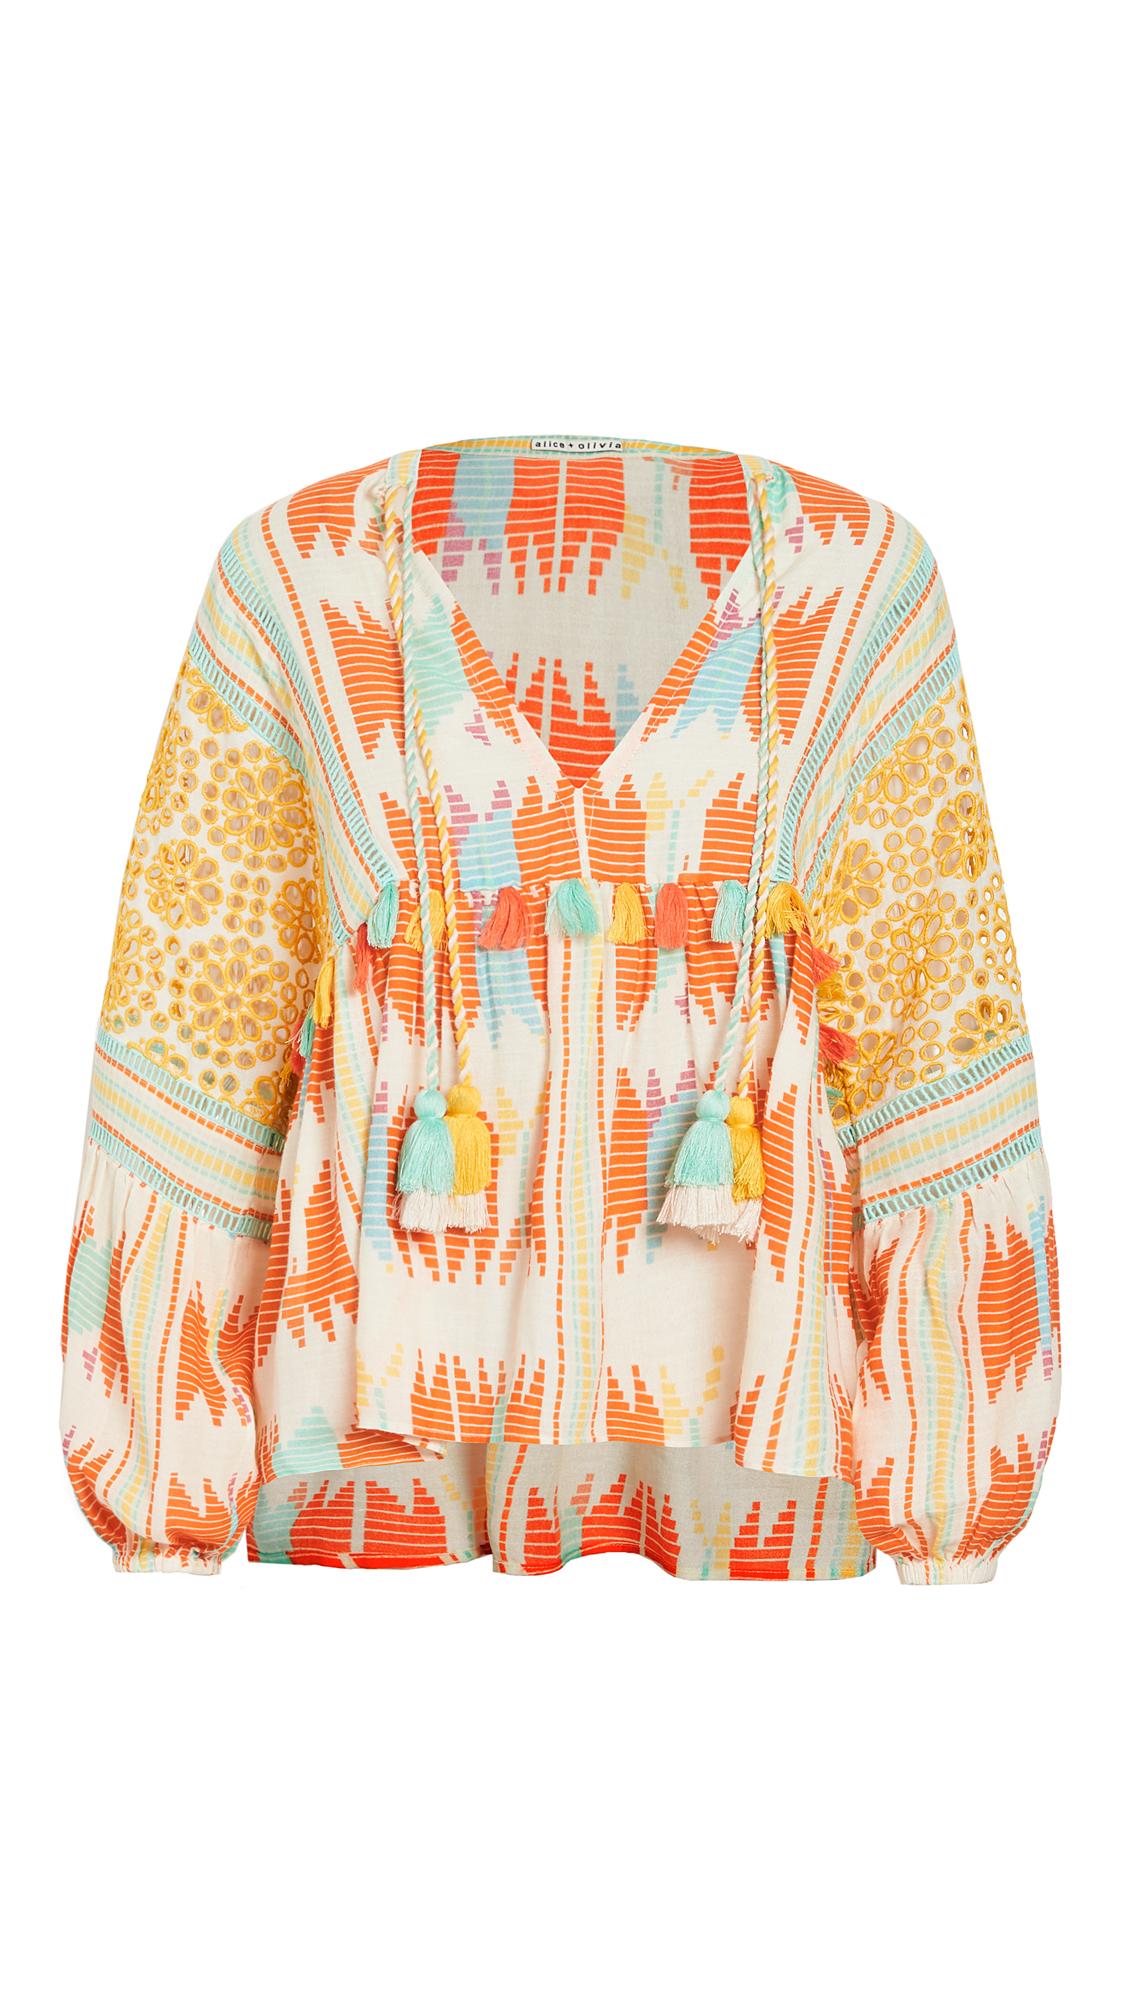 alice + olivia Rosana Embroidered Tunic Top